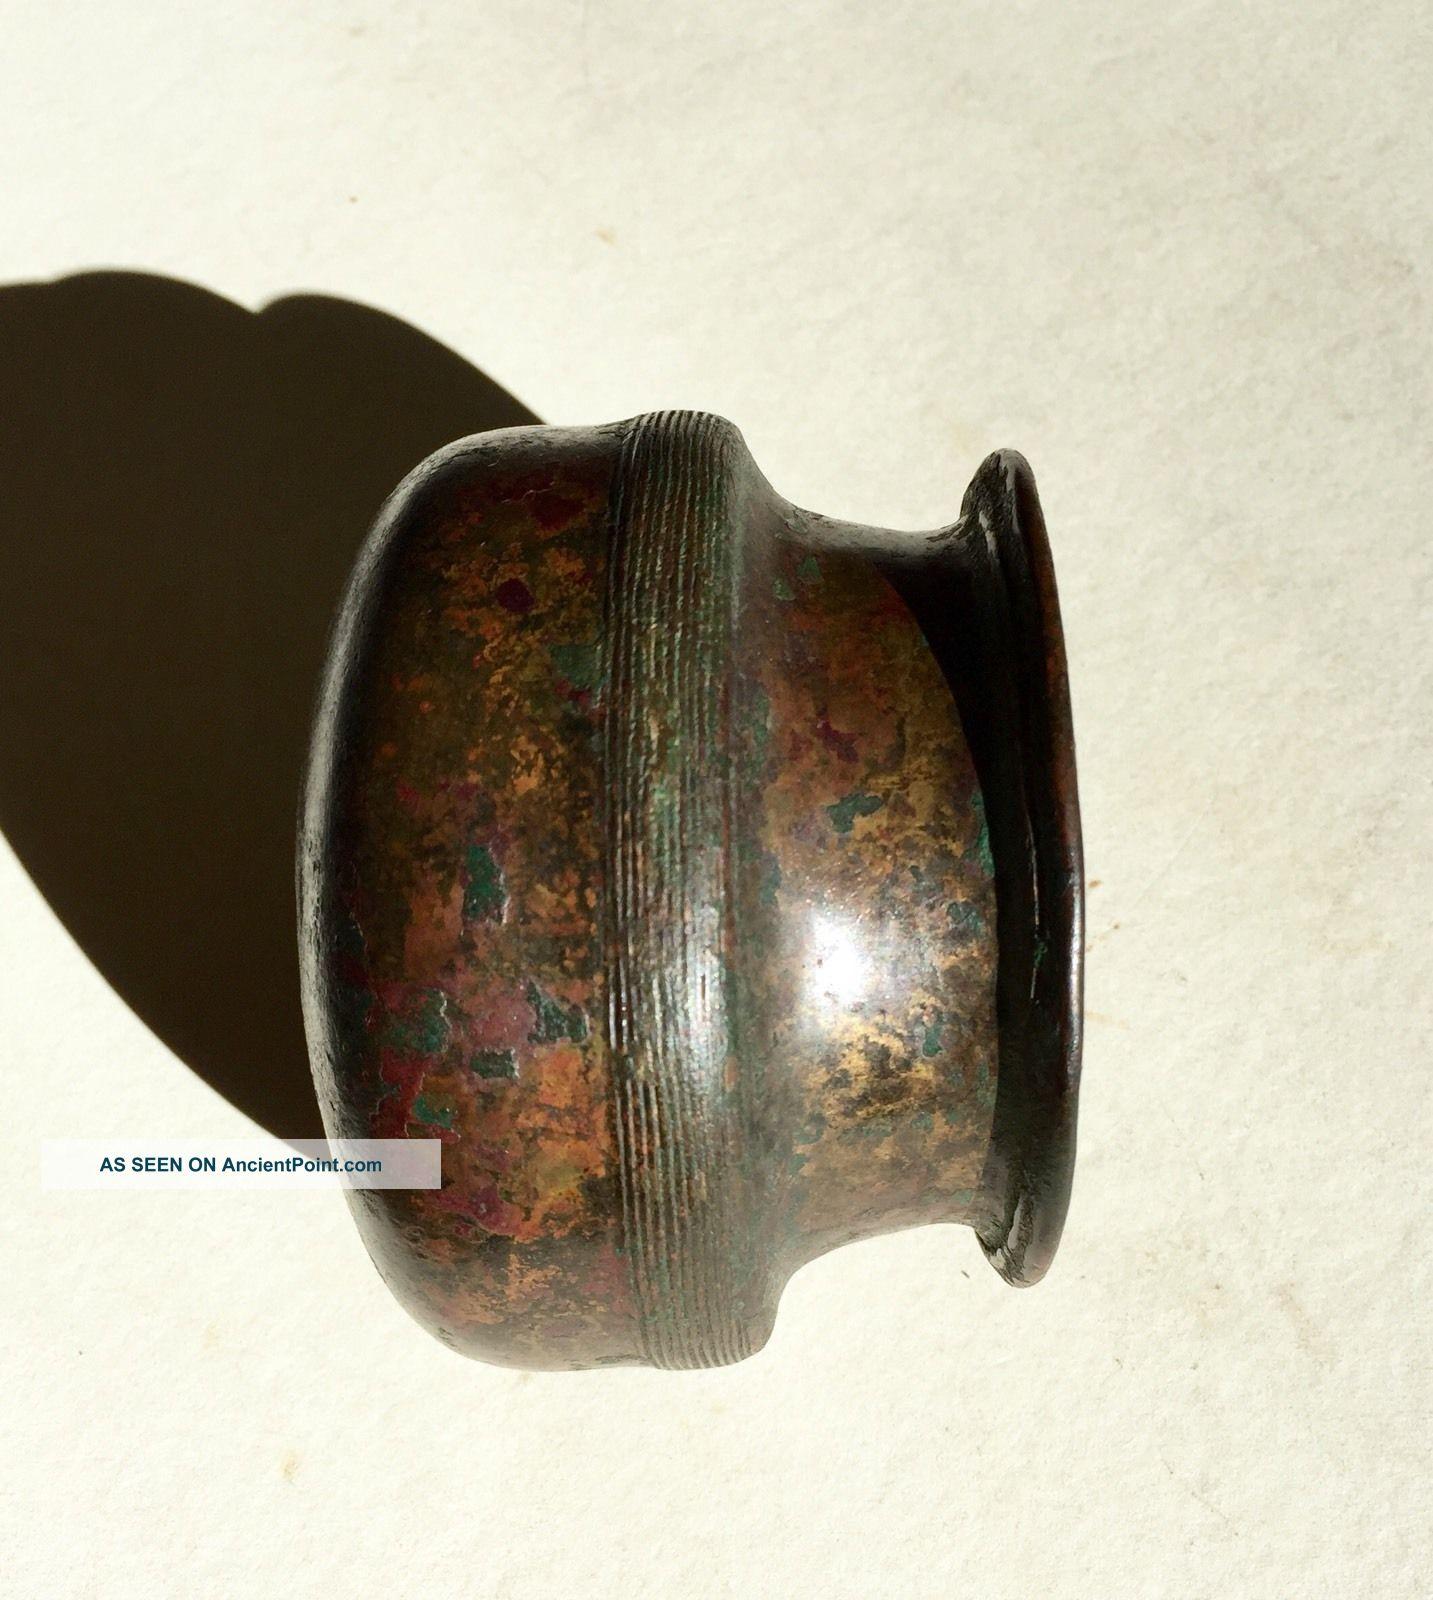 Ancient Persian Achaemenid Bronze Vessel C6th - 4th Century Bce Near Eastern photo